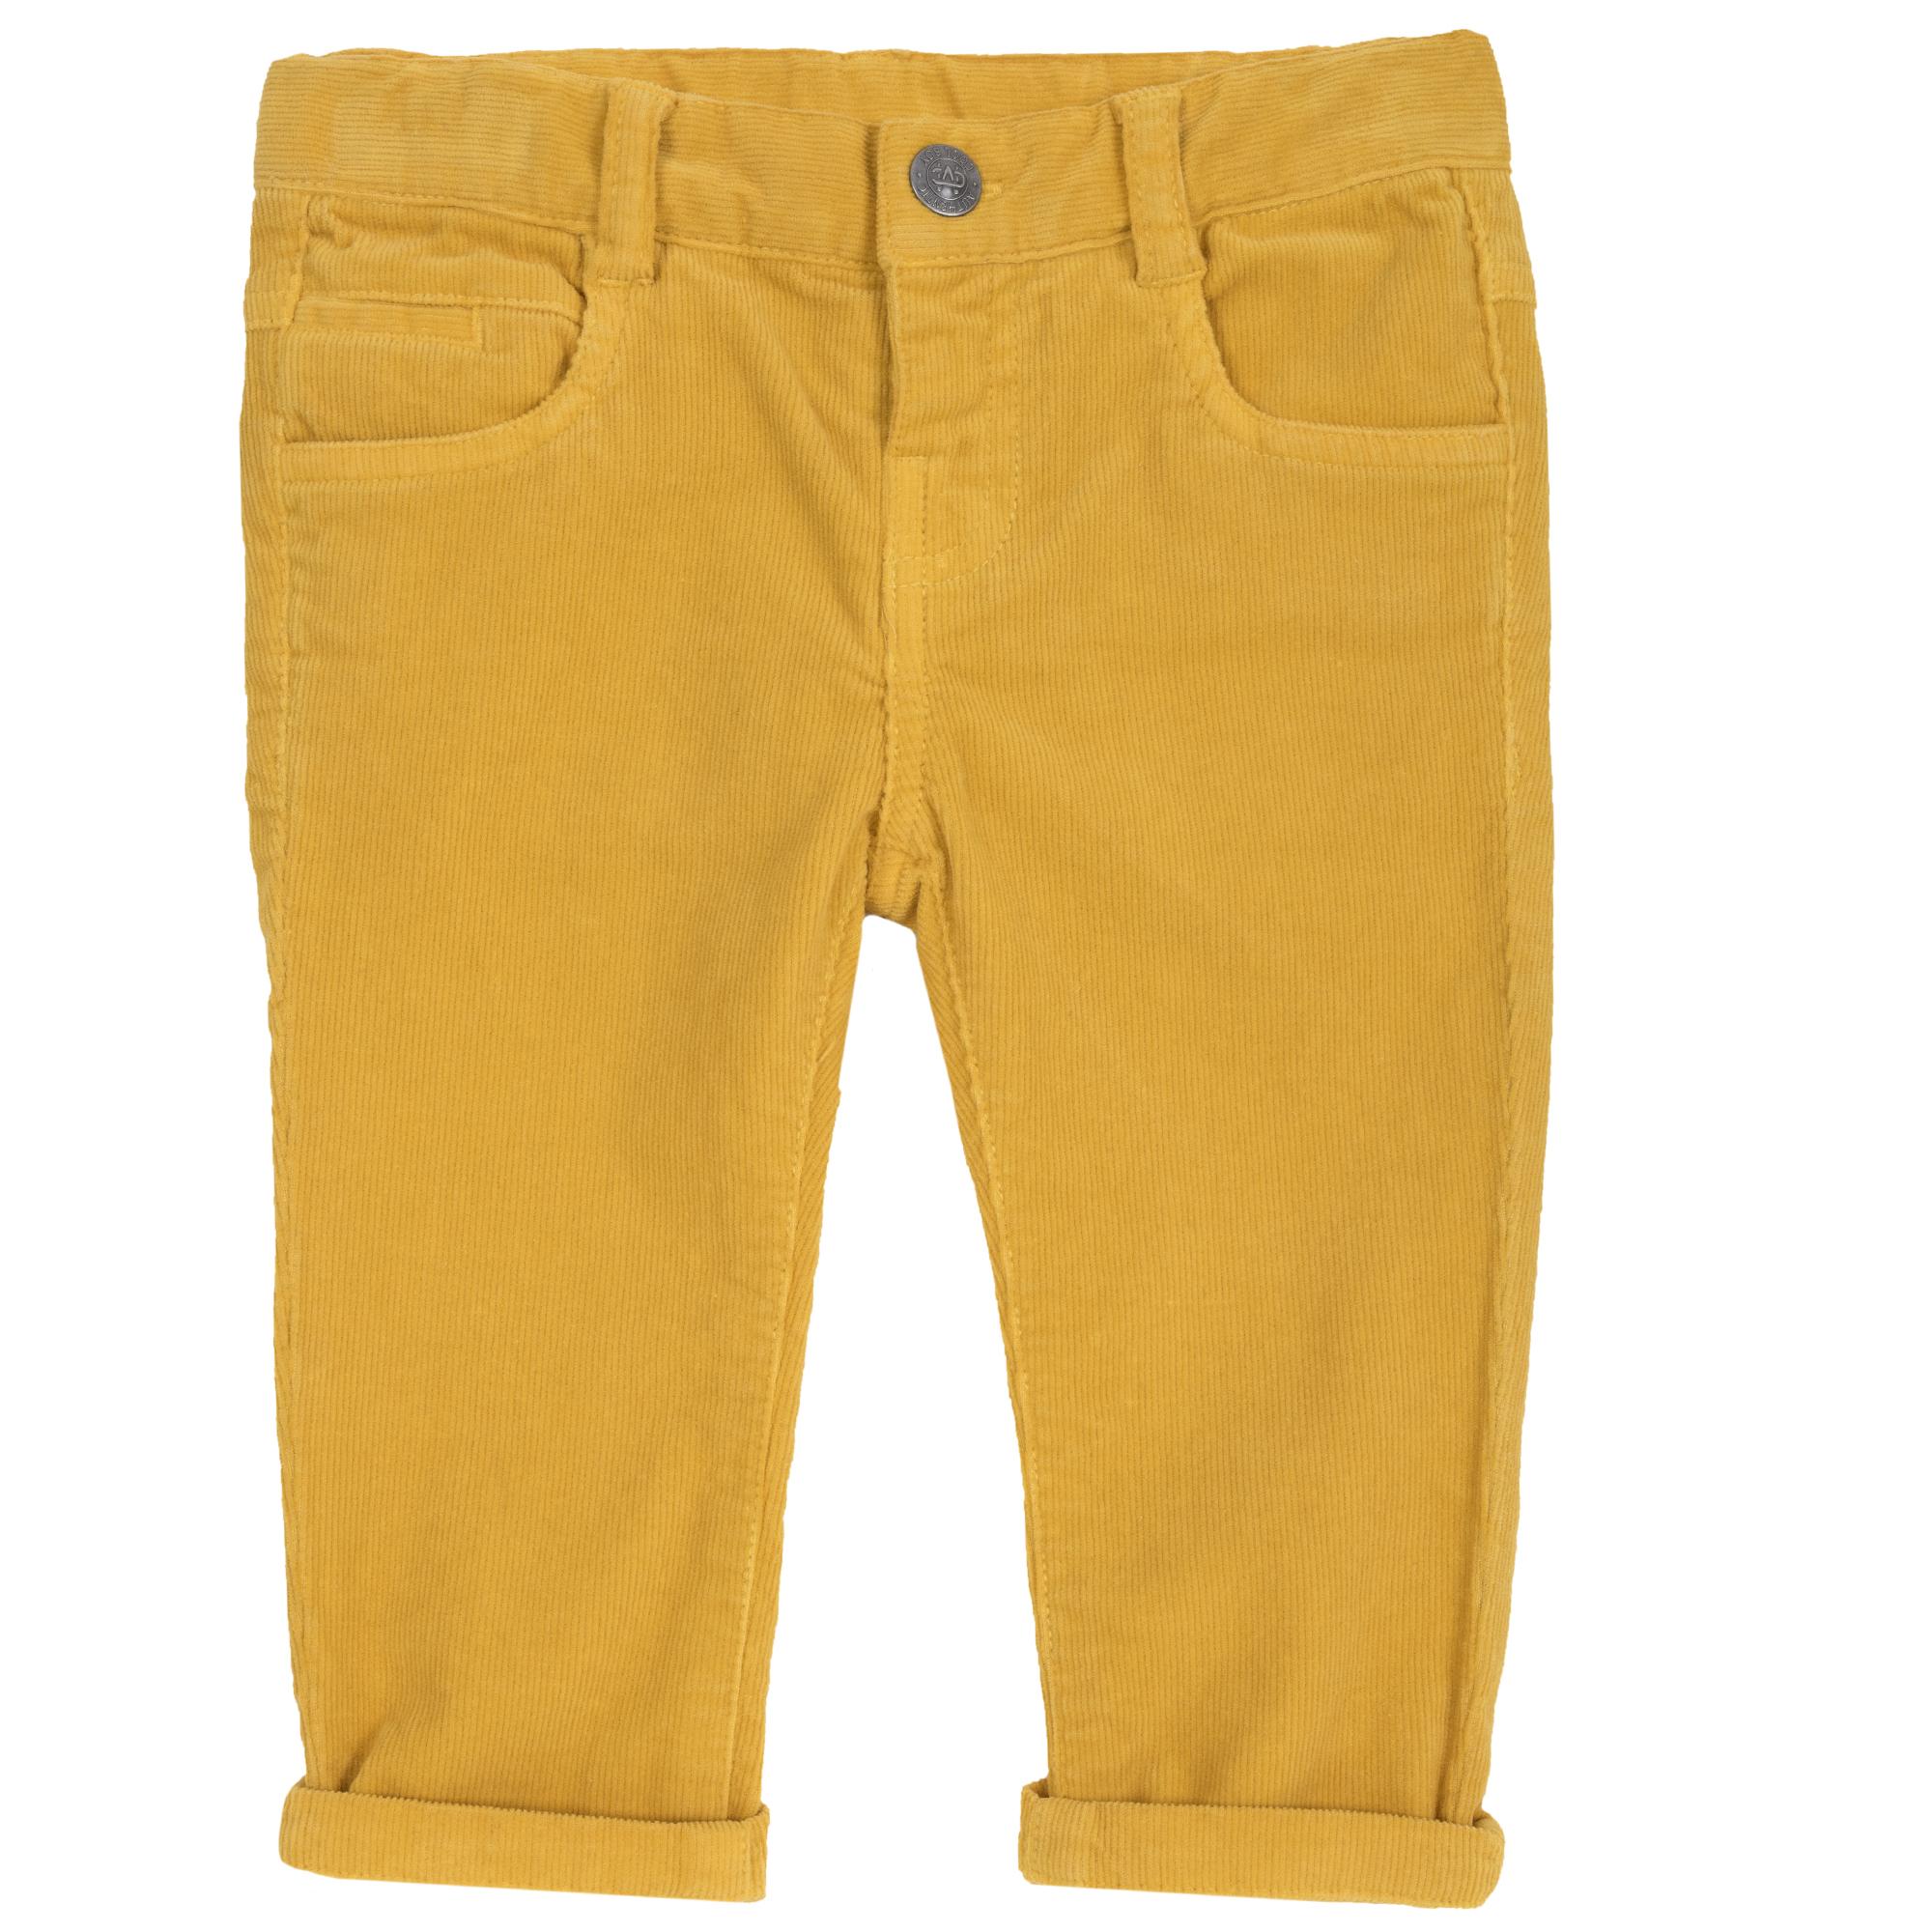 Pantalon copii Chicco, galben